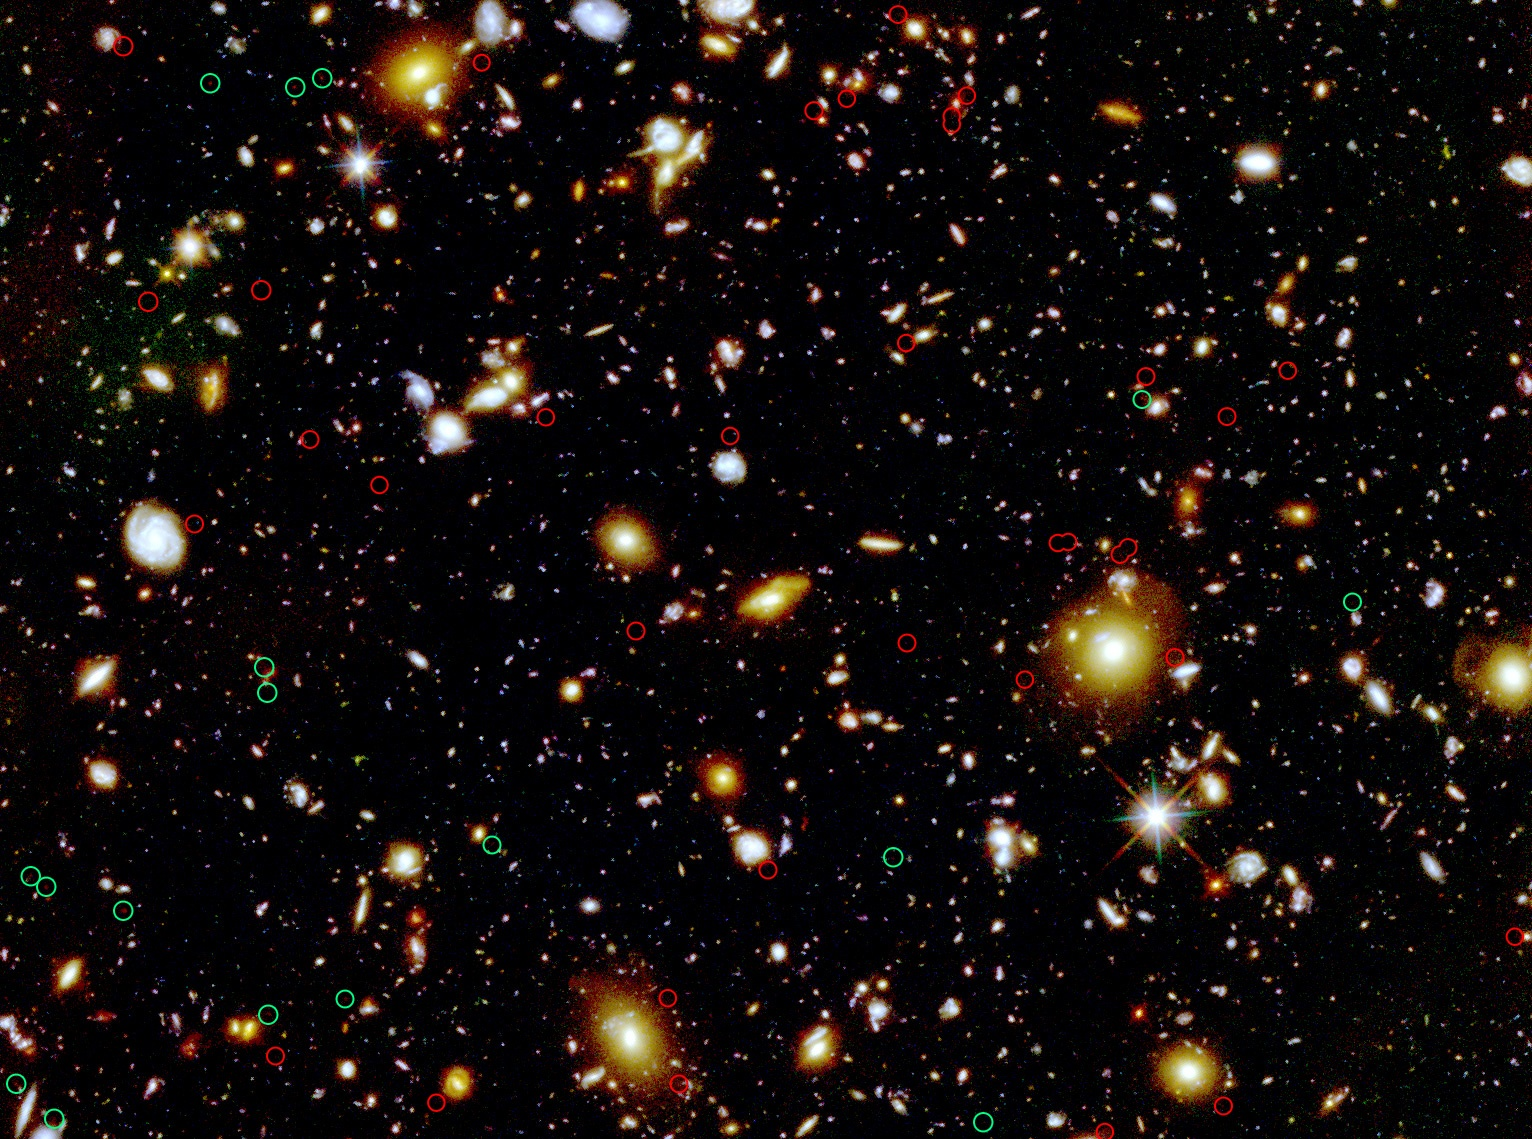 Какова температура тёмной материи? - 6